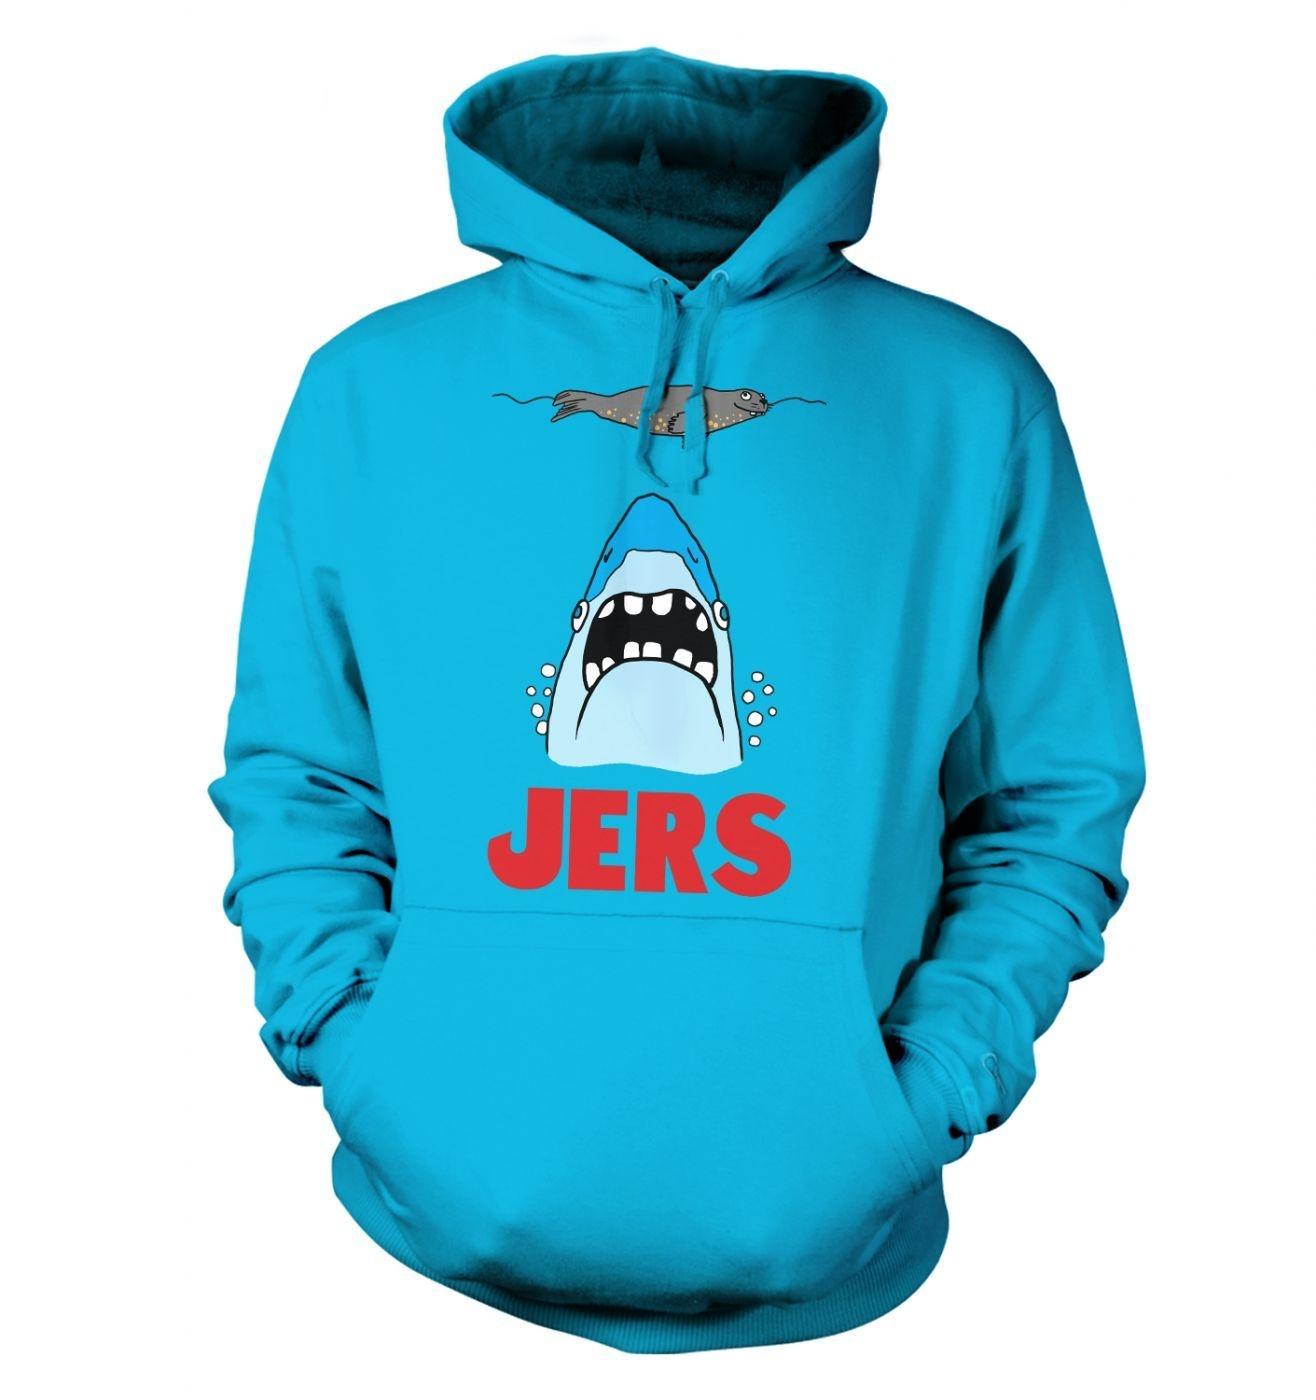 Jers hoodie